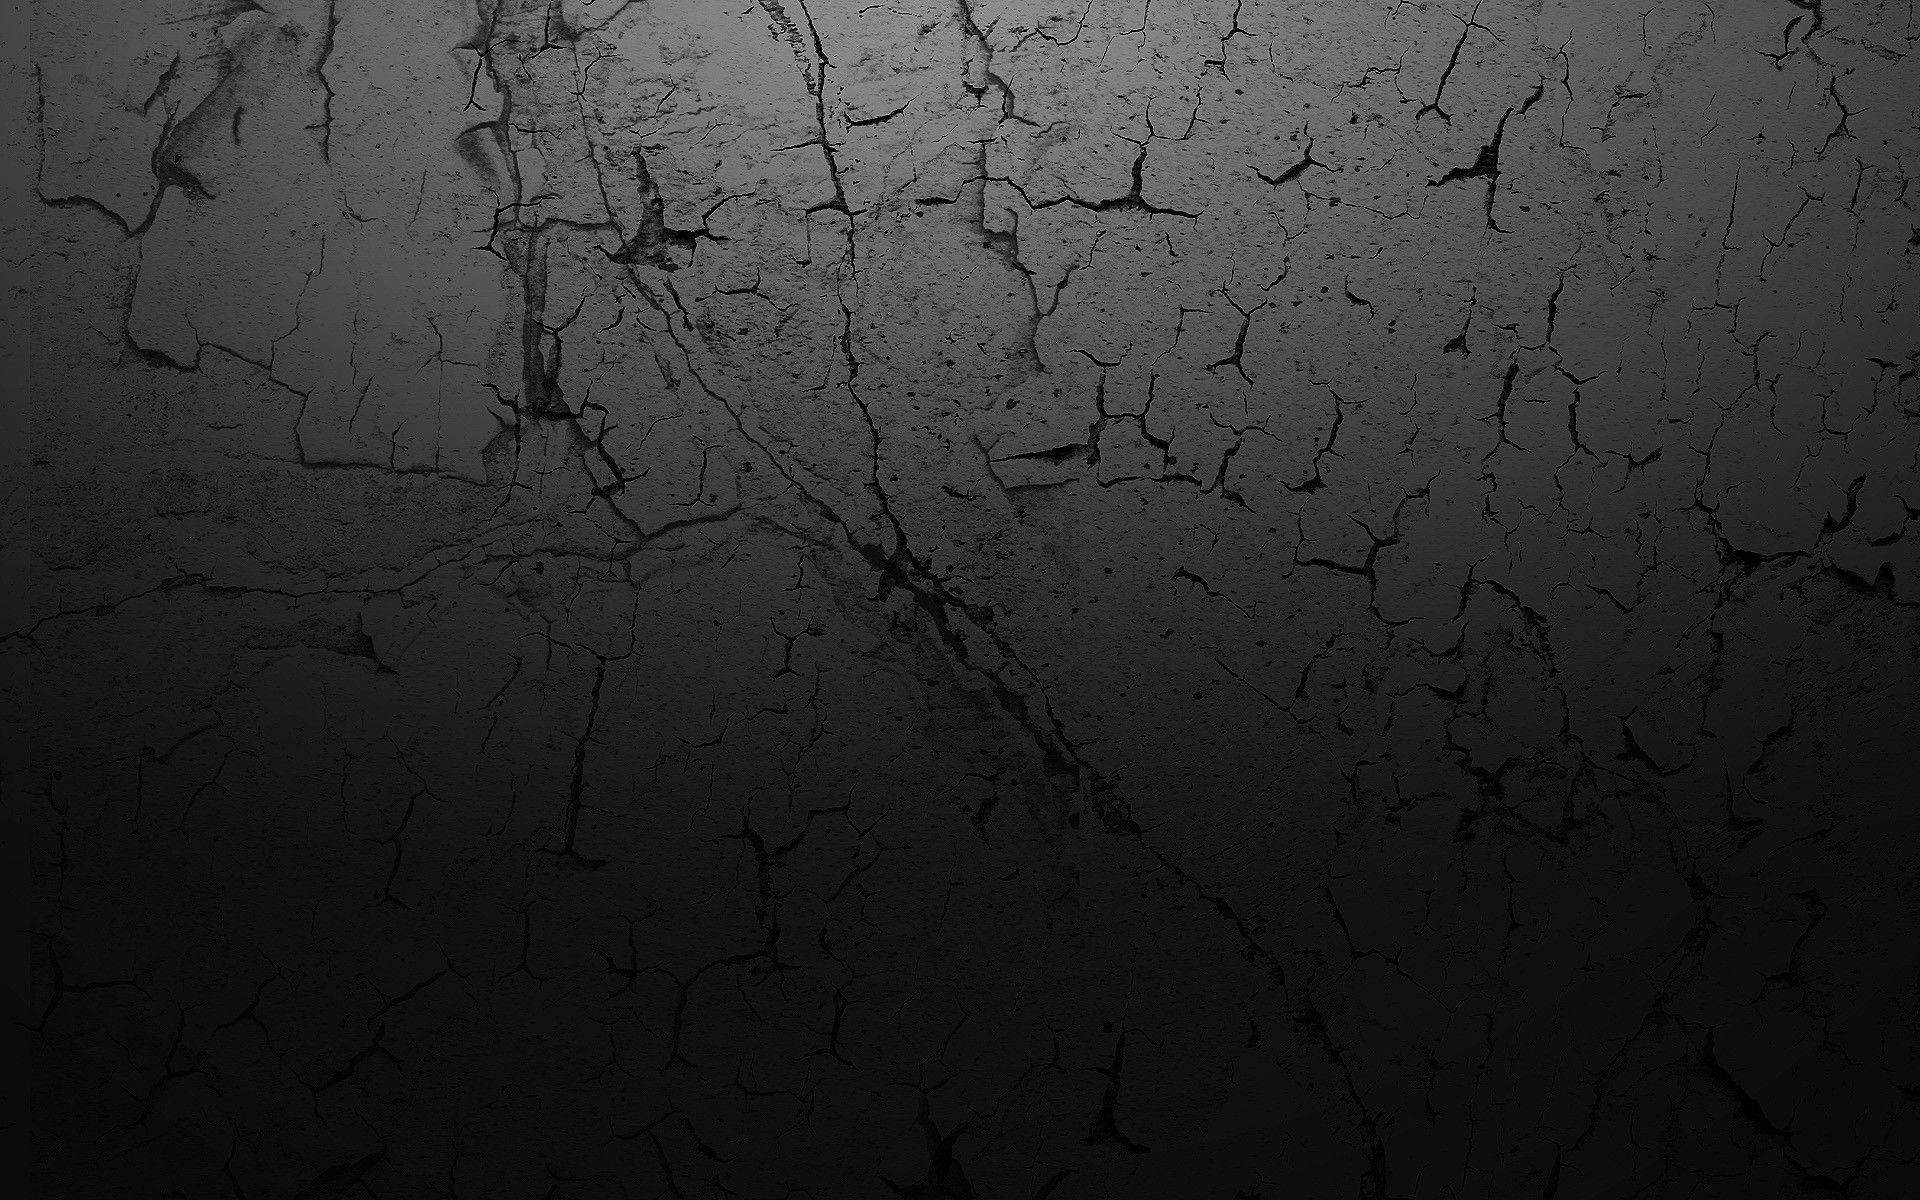 Cracked Texture Abstract HD Desktop Wallpaper, Texture Wallpaper, Crack  Wallpaper   Abstract No.